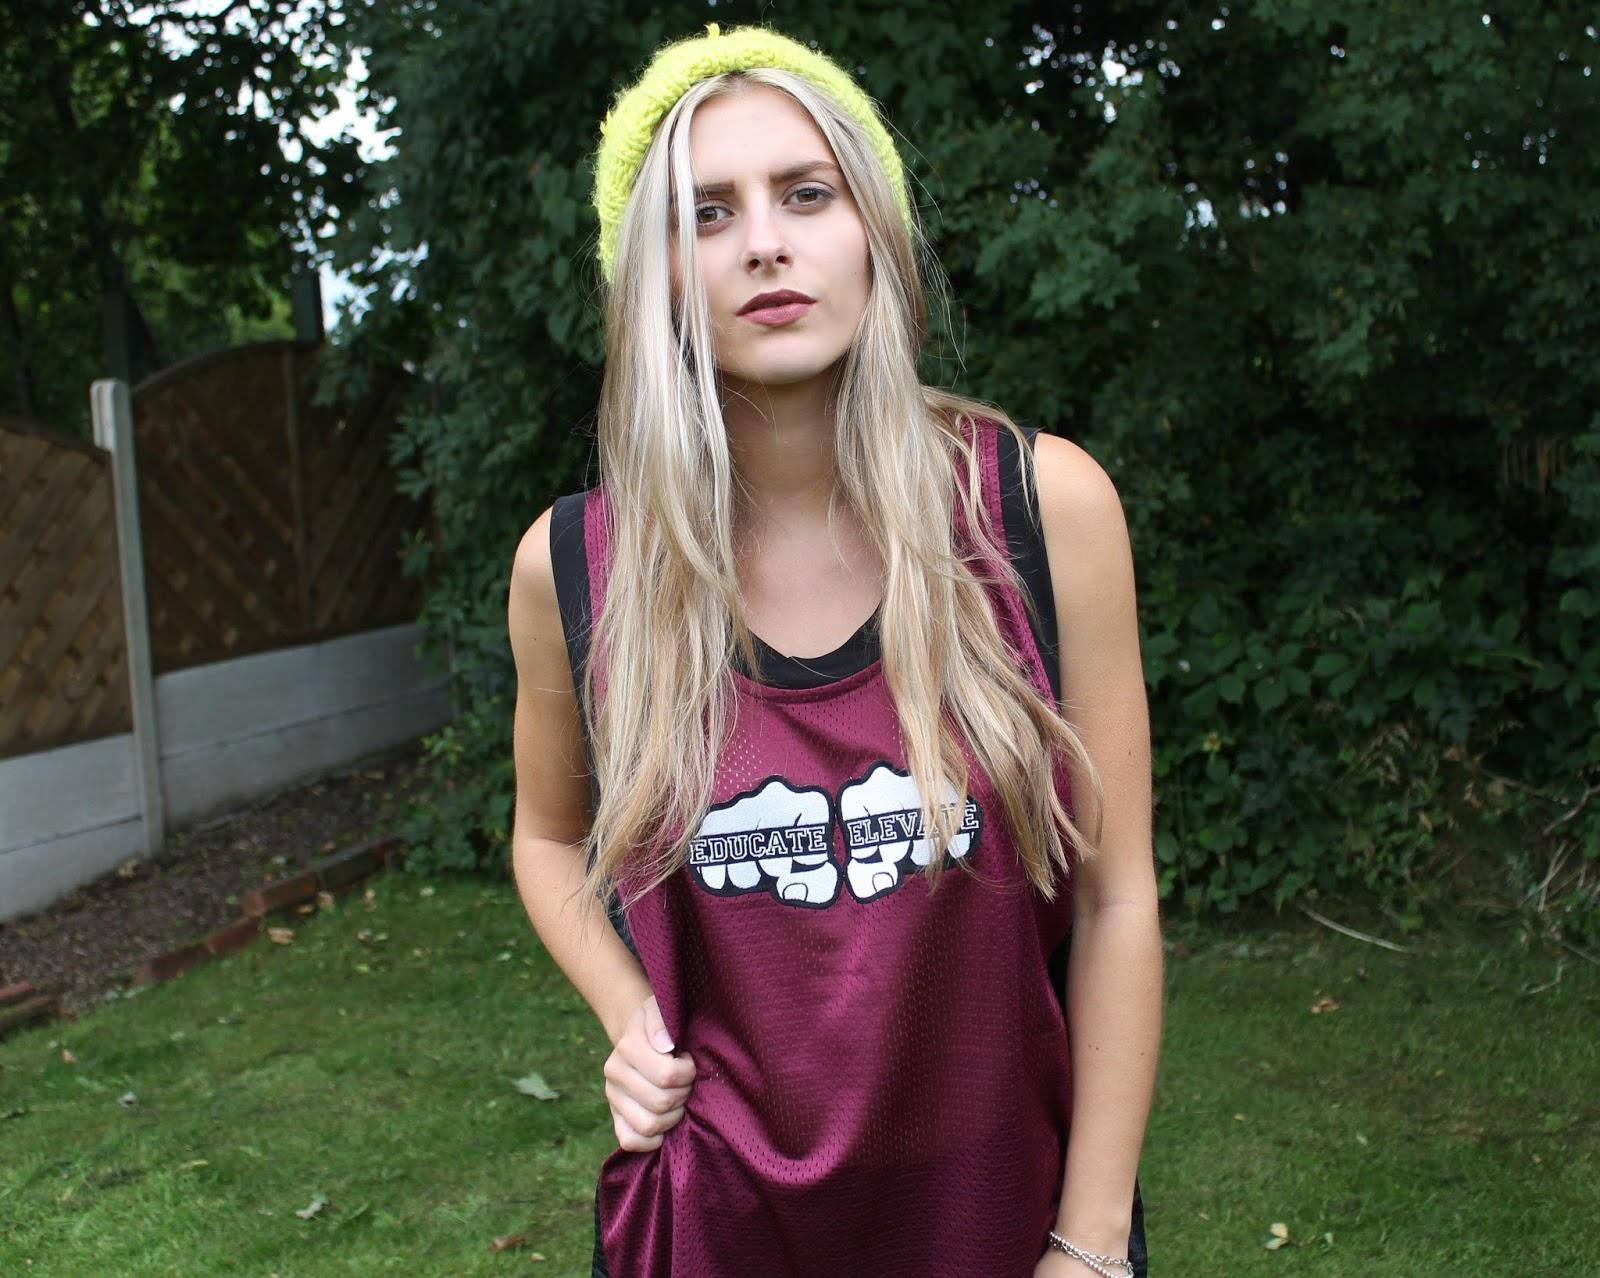 2016 High School Senior girl for posing picture ideas ... |Plum Basketball Dress